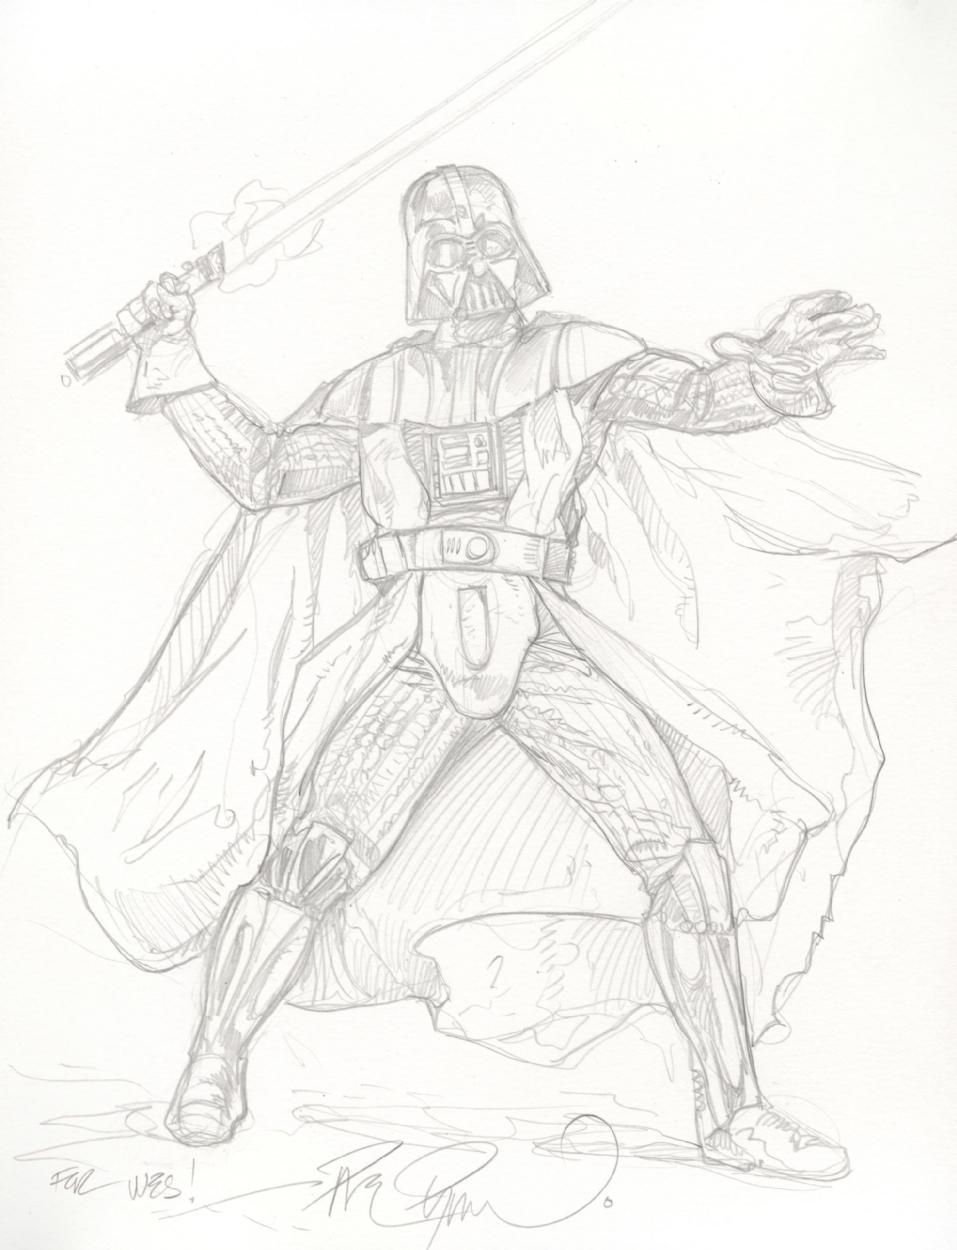 957x1250 Darth Vader, In Wesley Dupont's Star Wars Comic Art Gallery Room